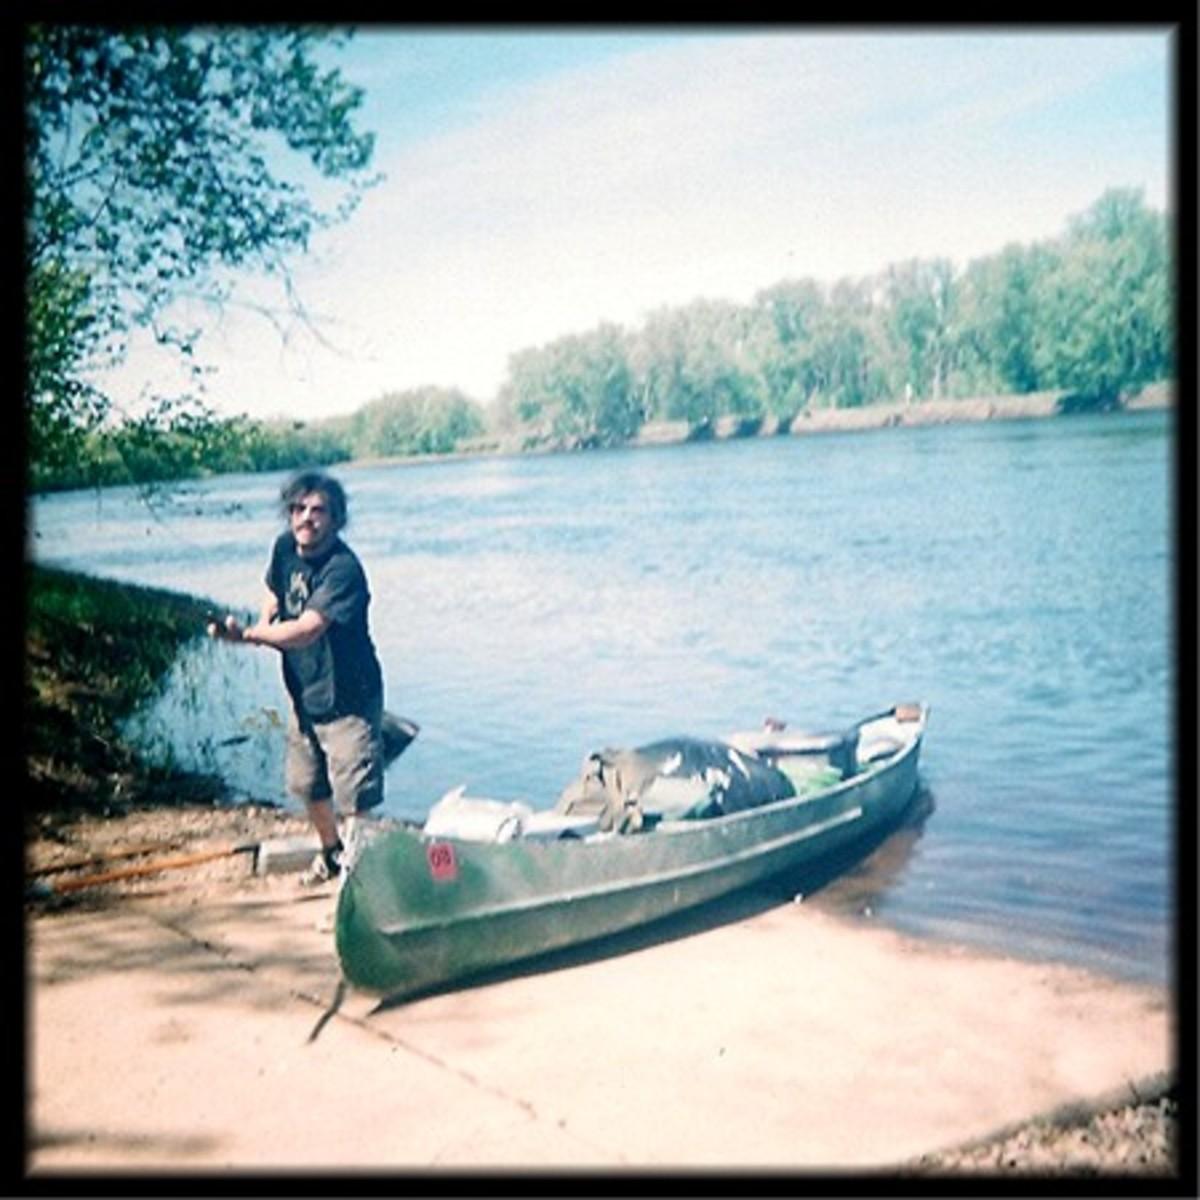 Able to Camp & Canoe Again!